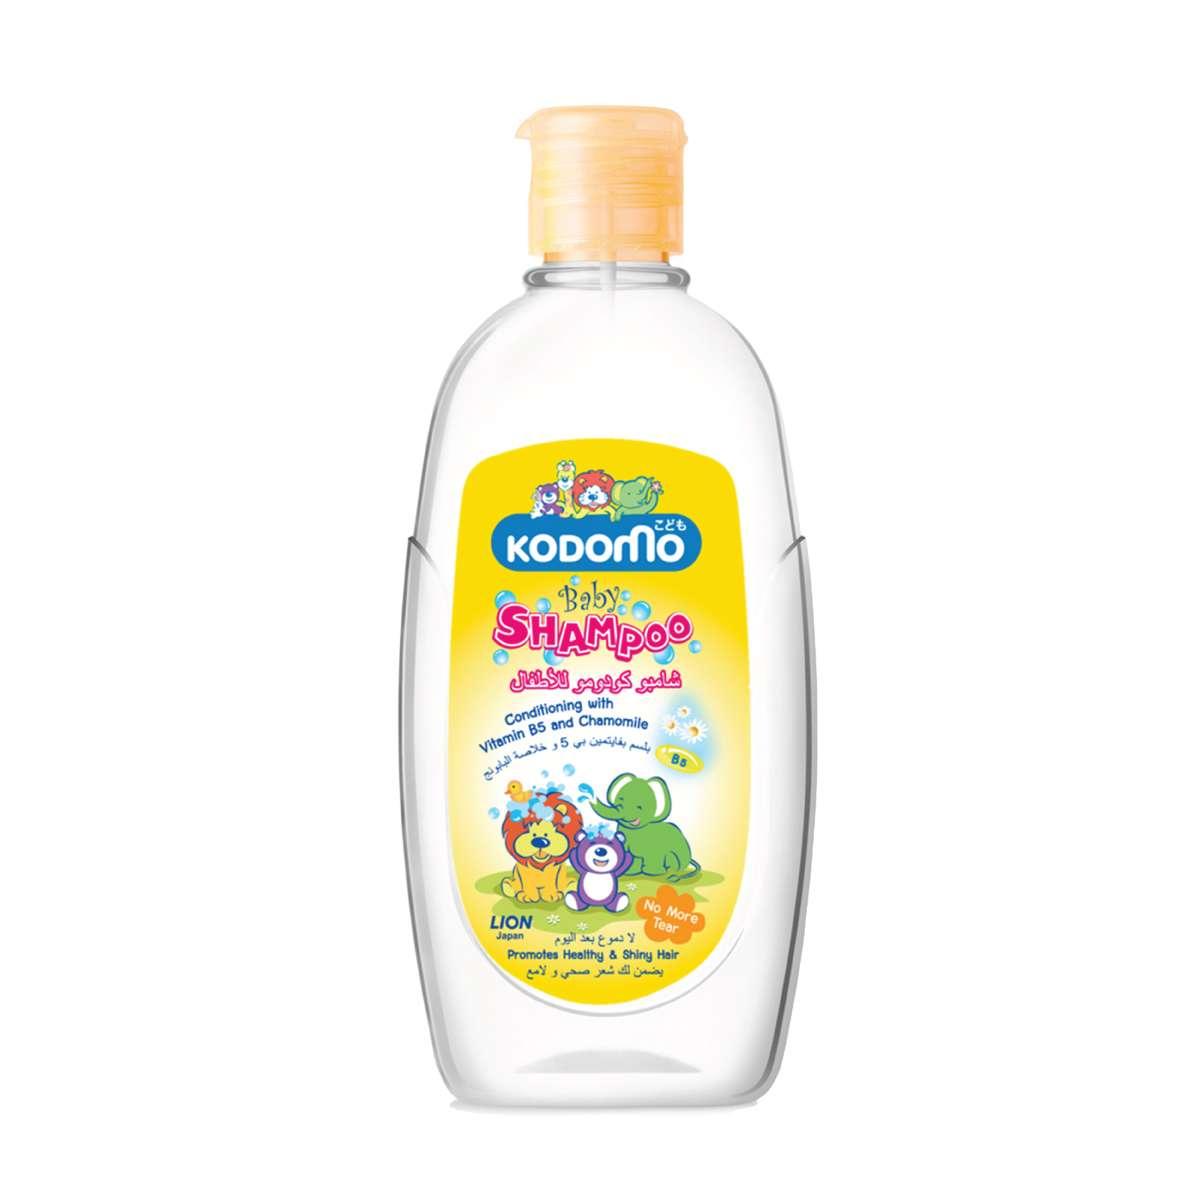 KODOMO Baby Shampoo Gentle 200 ml